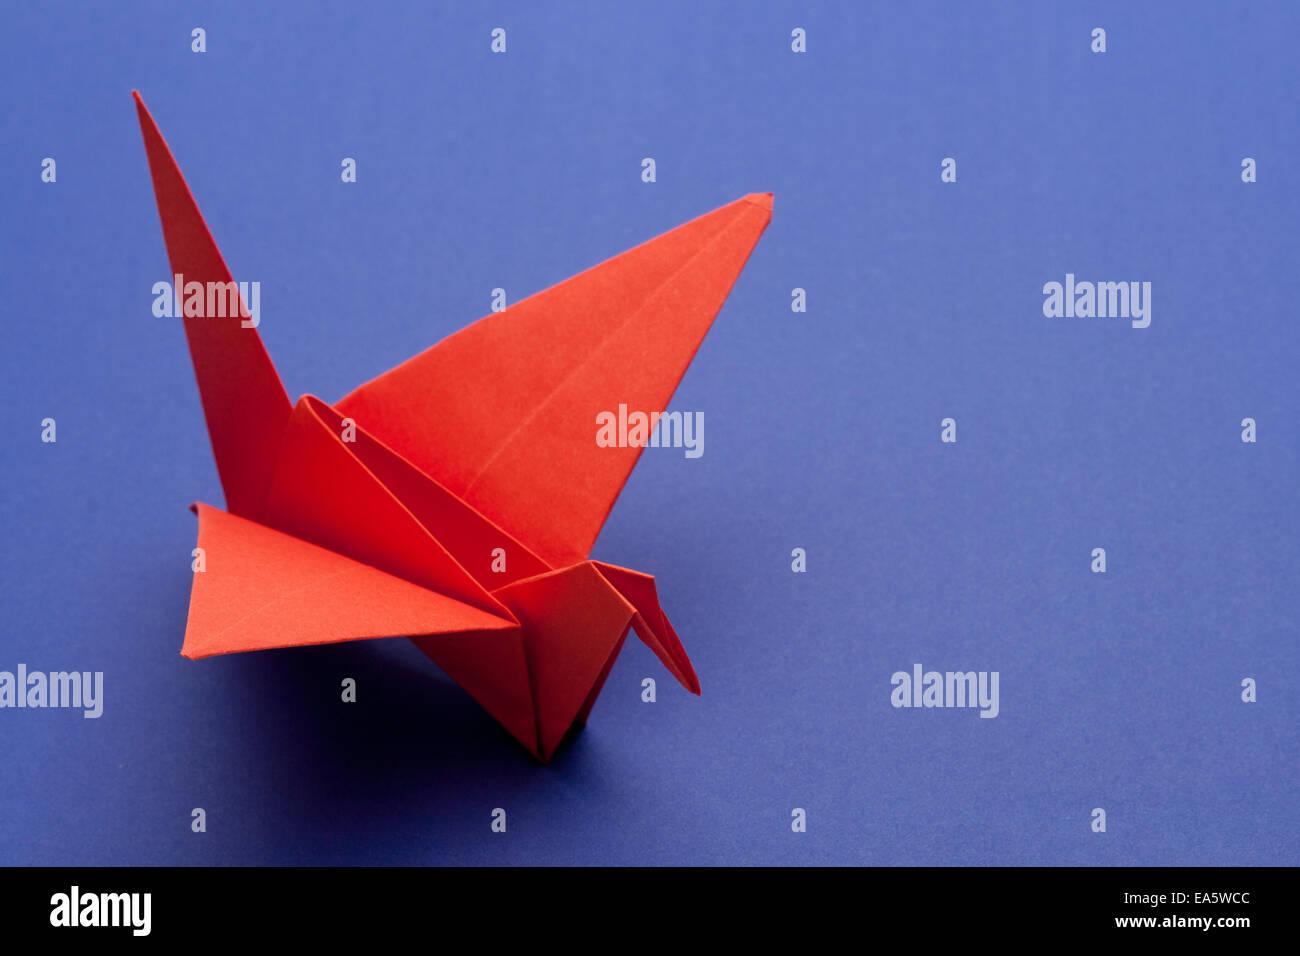 Origami-Papier-Kranich Stockbild